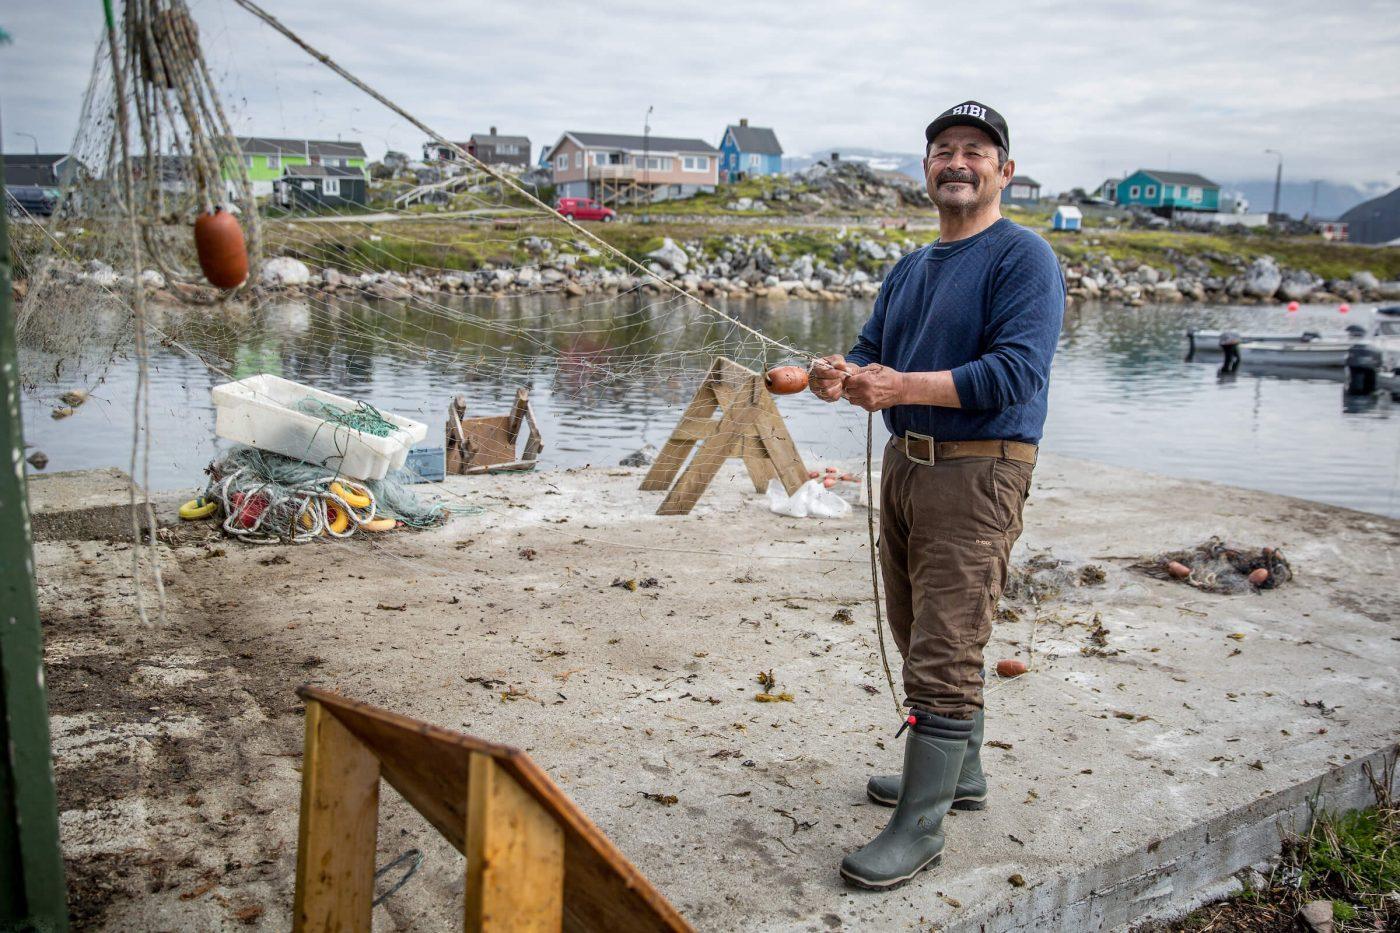 Smiling man with cap preparing his fishing net at the harbour in Nanortalik, South Greenland. Photo by Nanortalik Tourism Service